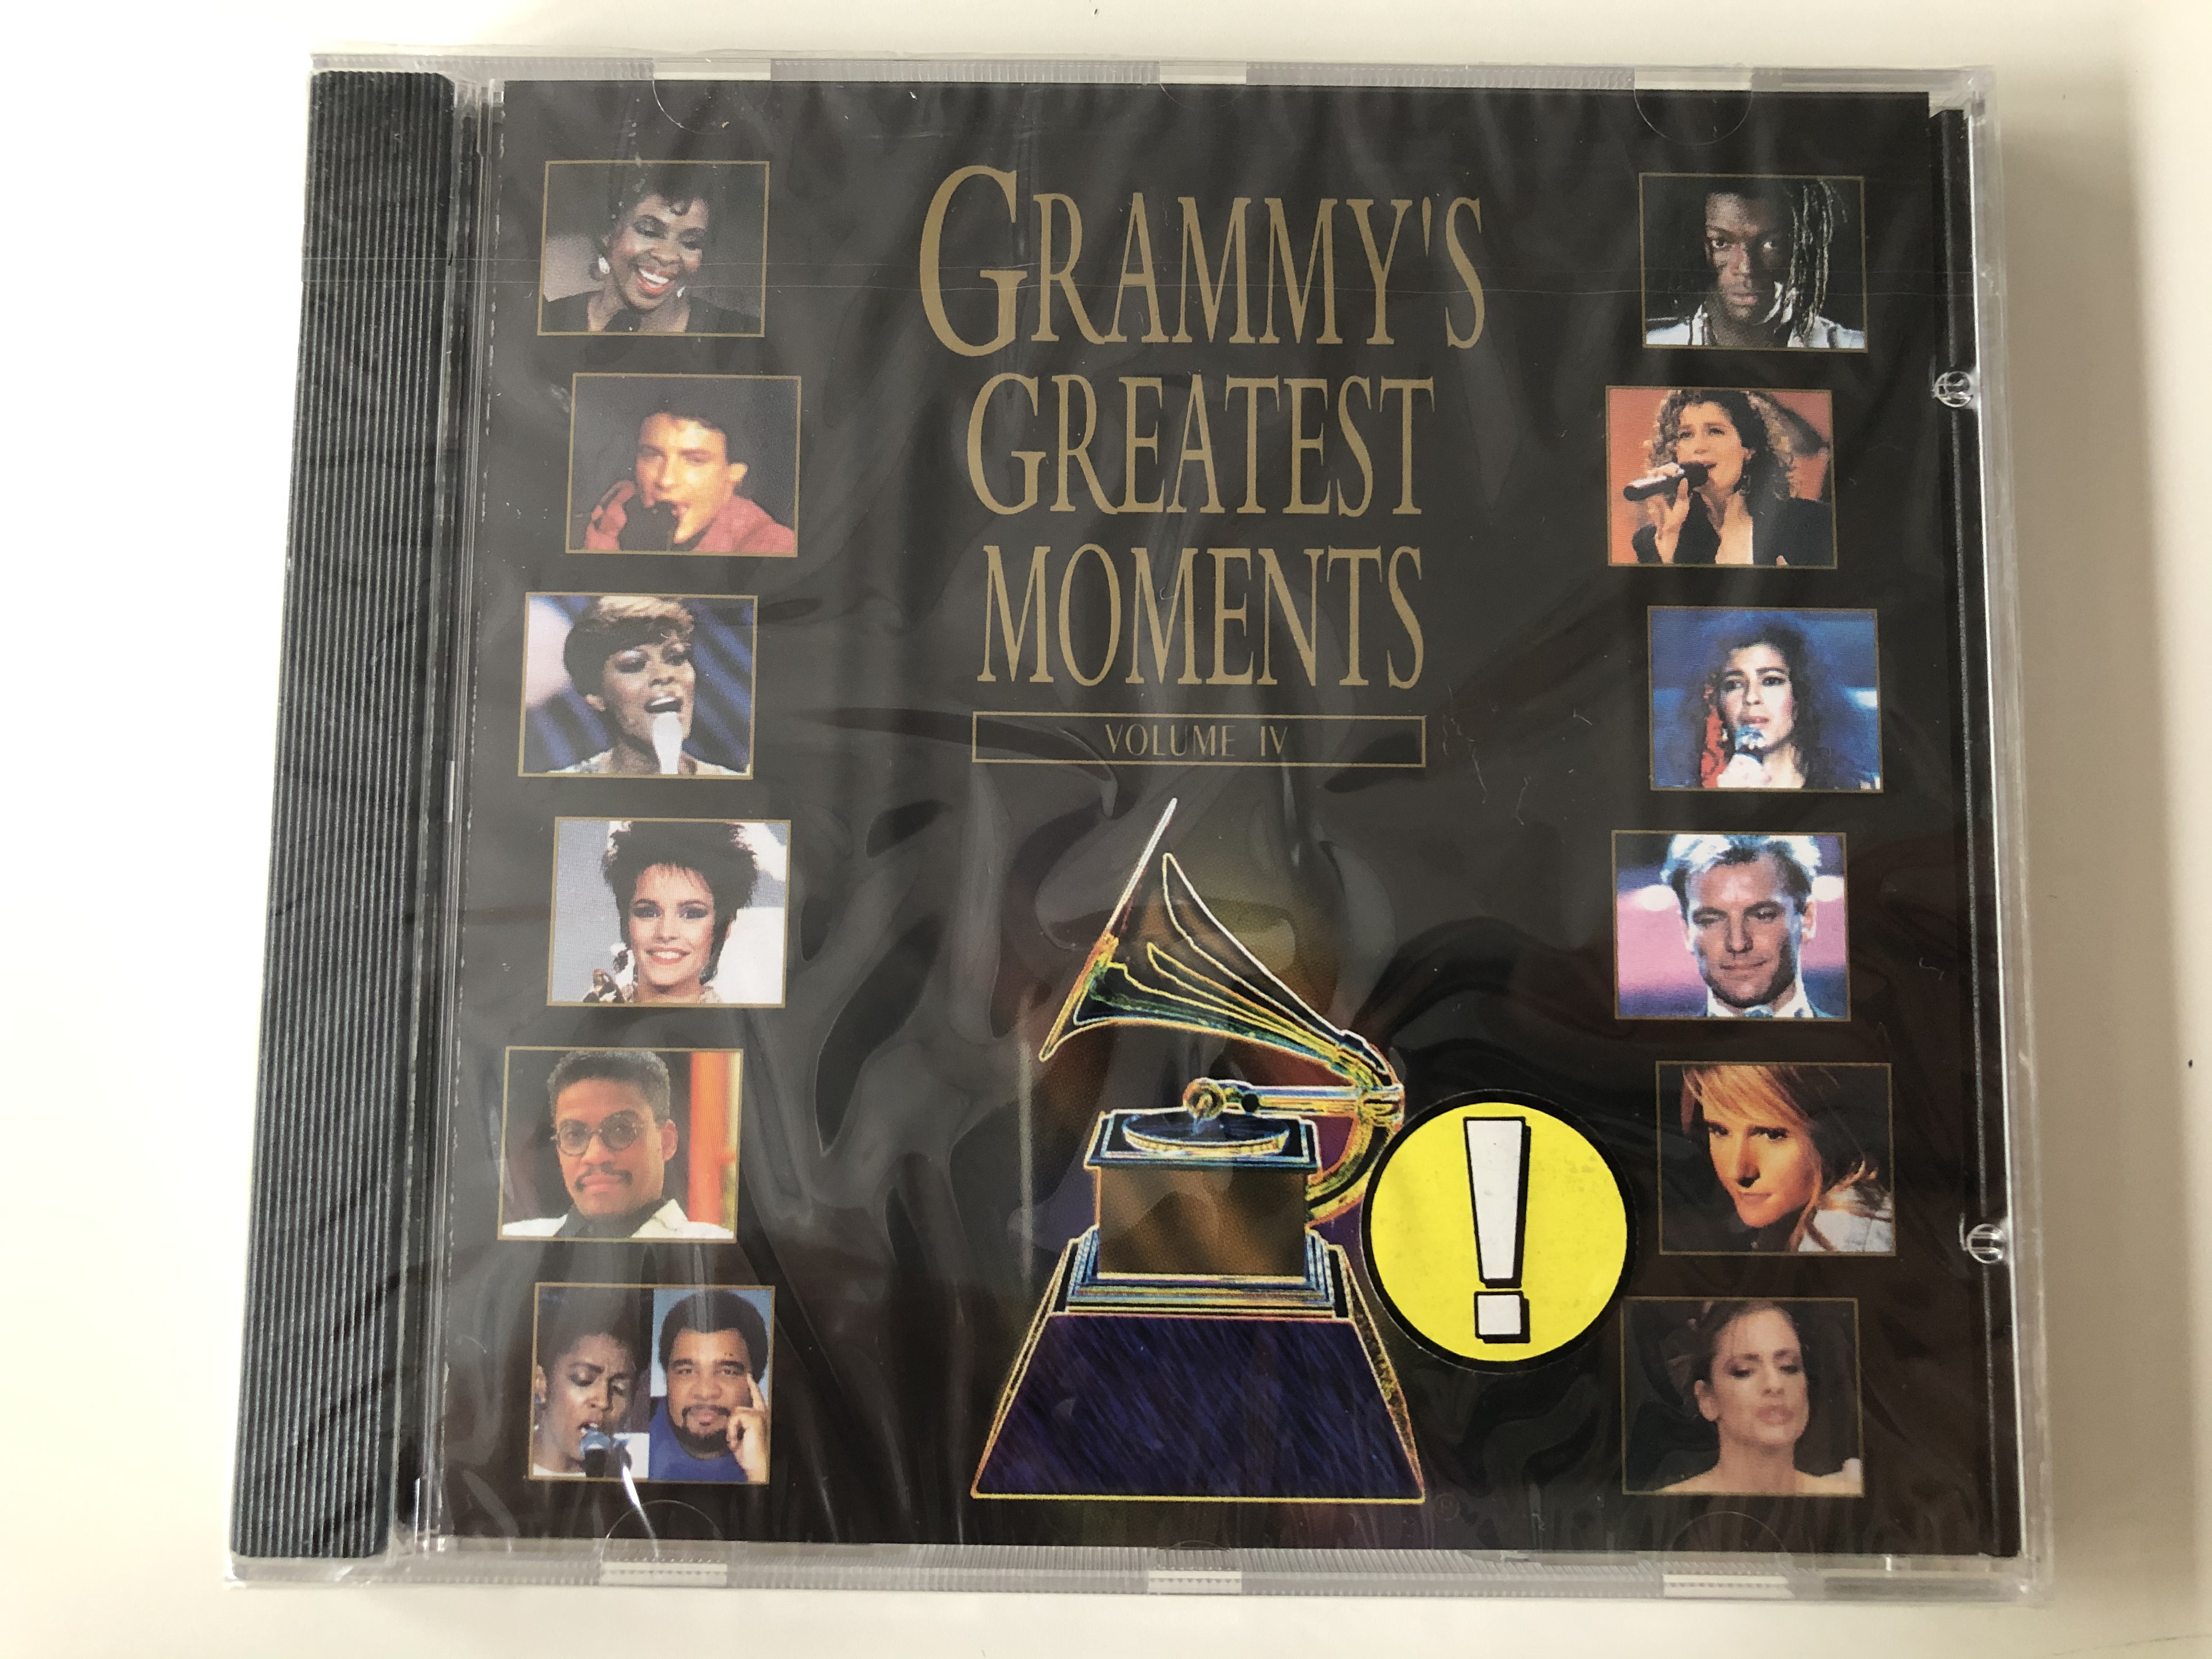 grammy-s-greatest-moments-volume-iv-atlantic-audio-cd-1994-7567-82577-2-1-.jpg